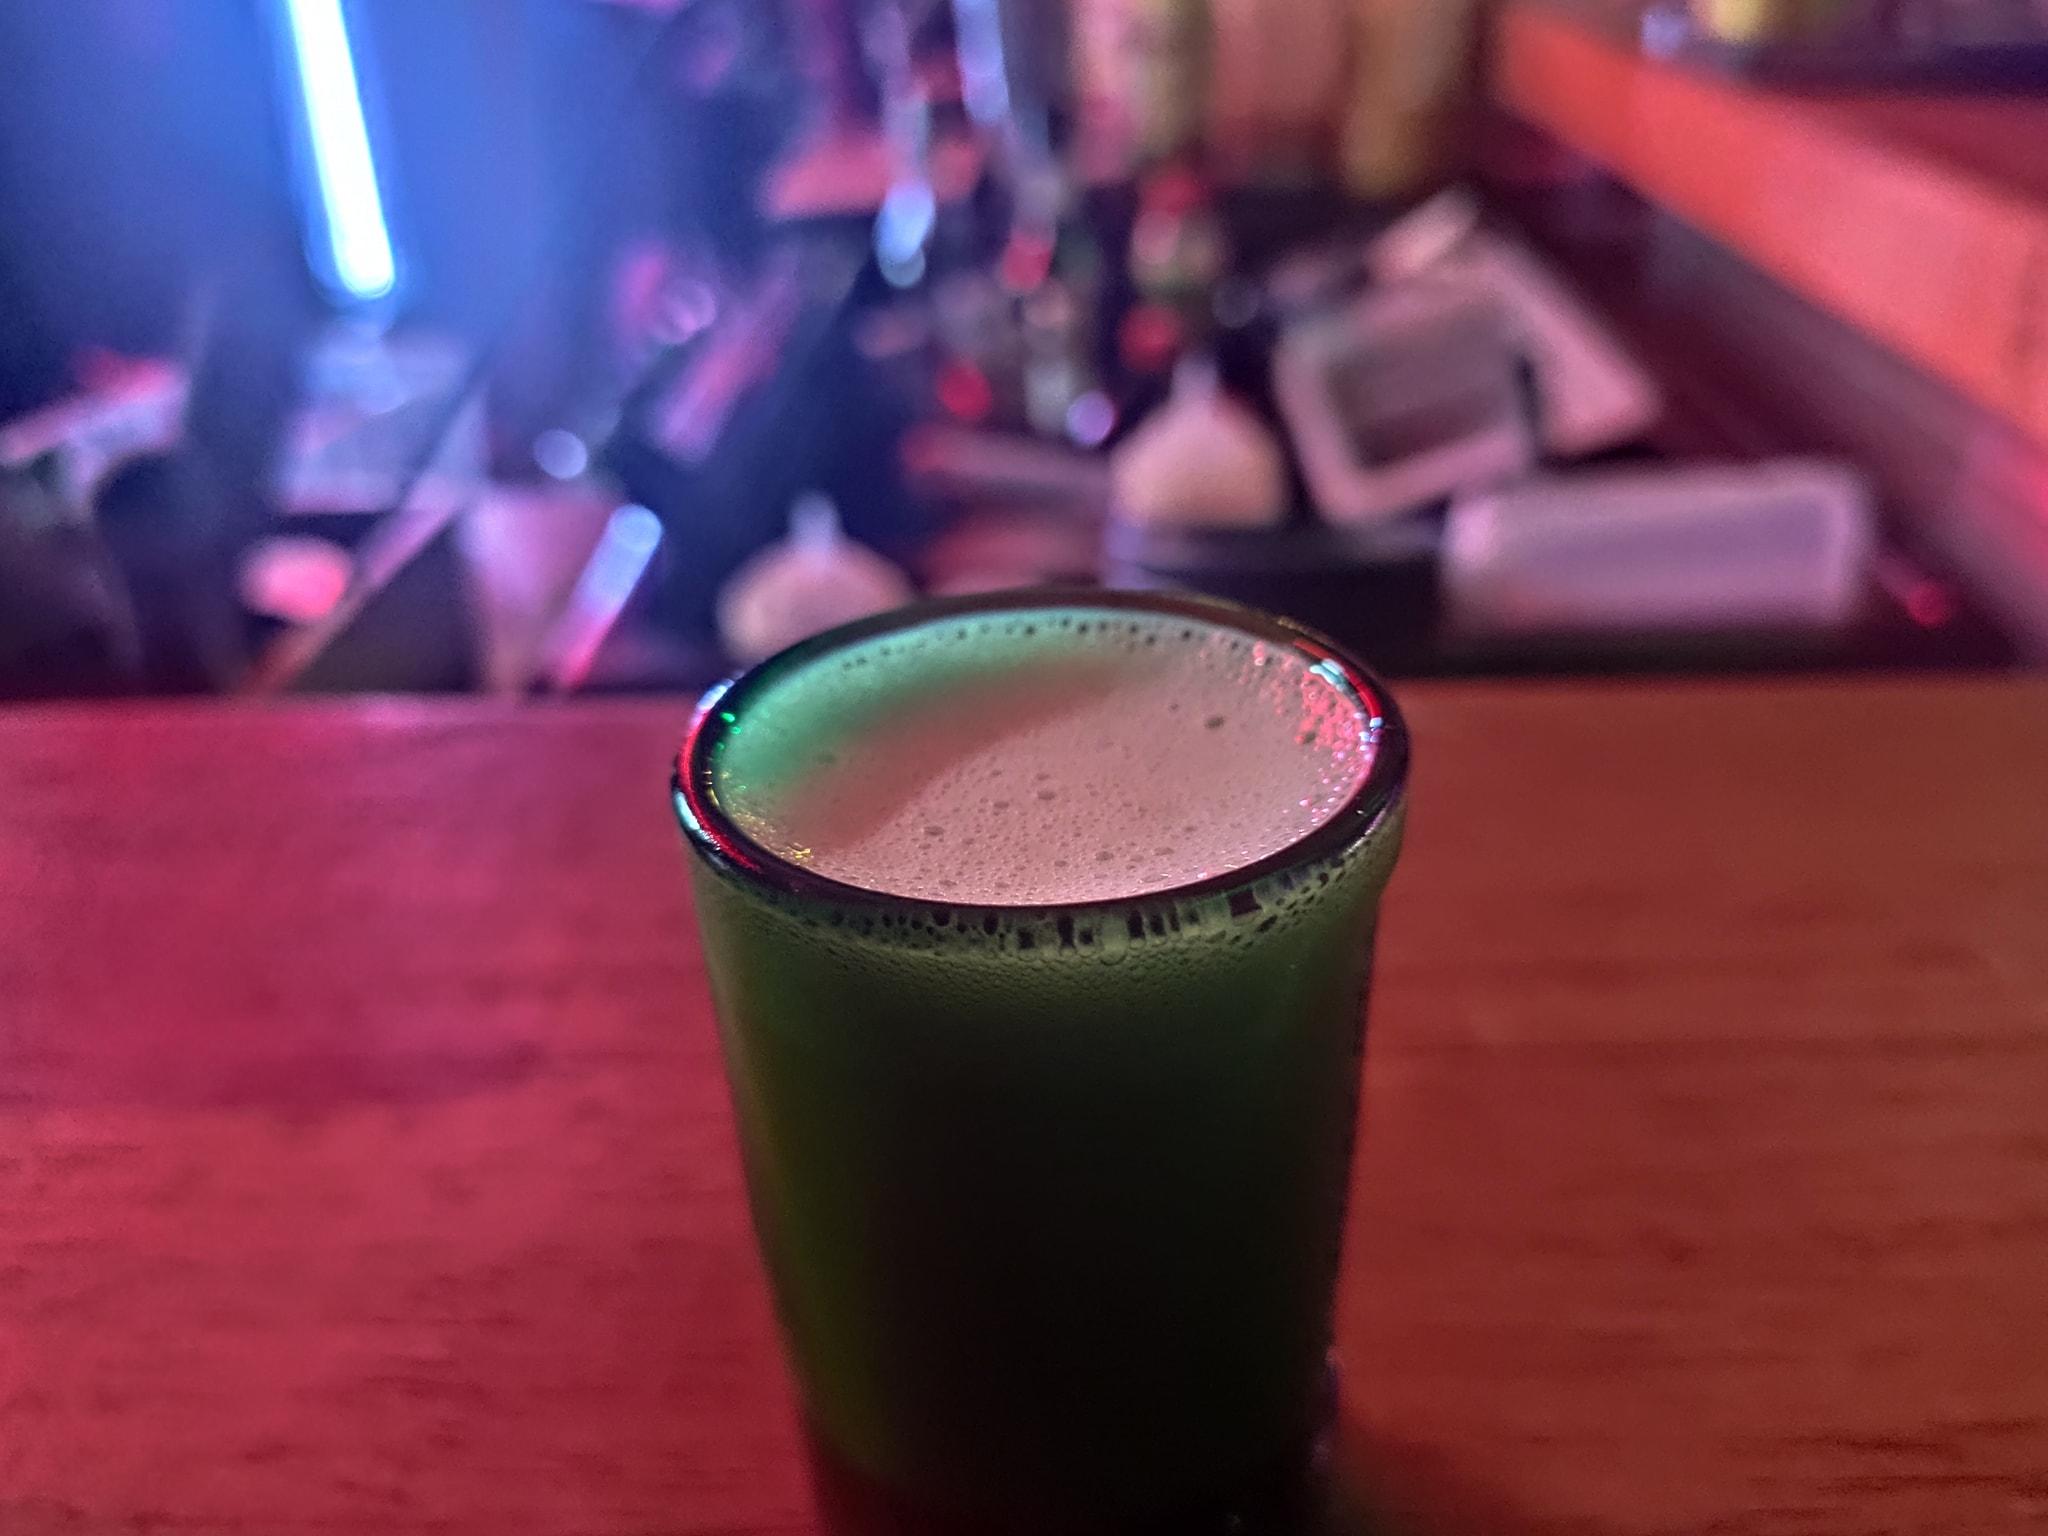 After Eight - The 7Th Heaven - Bar de nuit cocktails rooftop - Fréjus